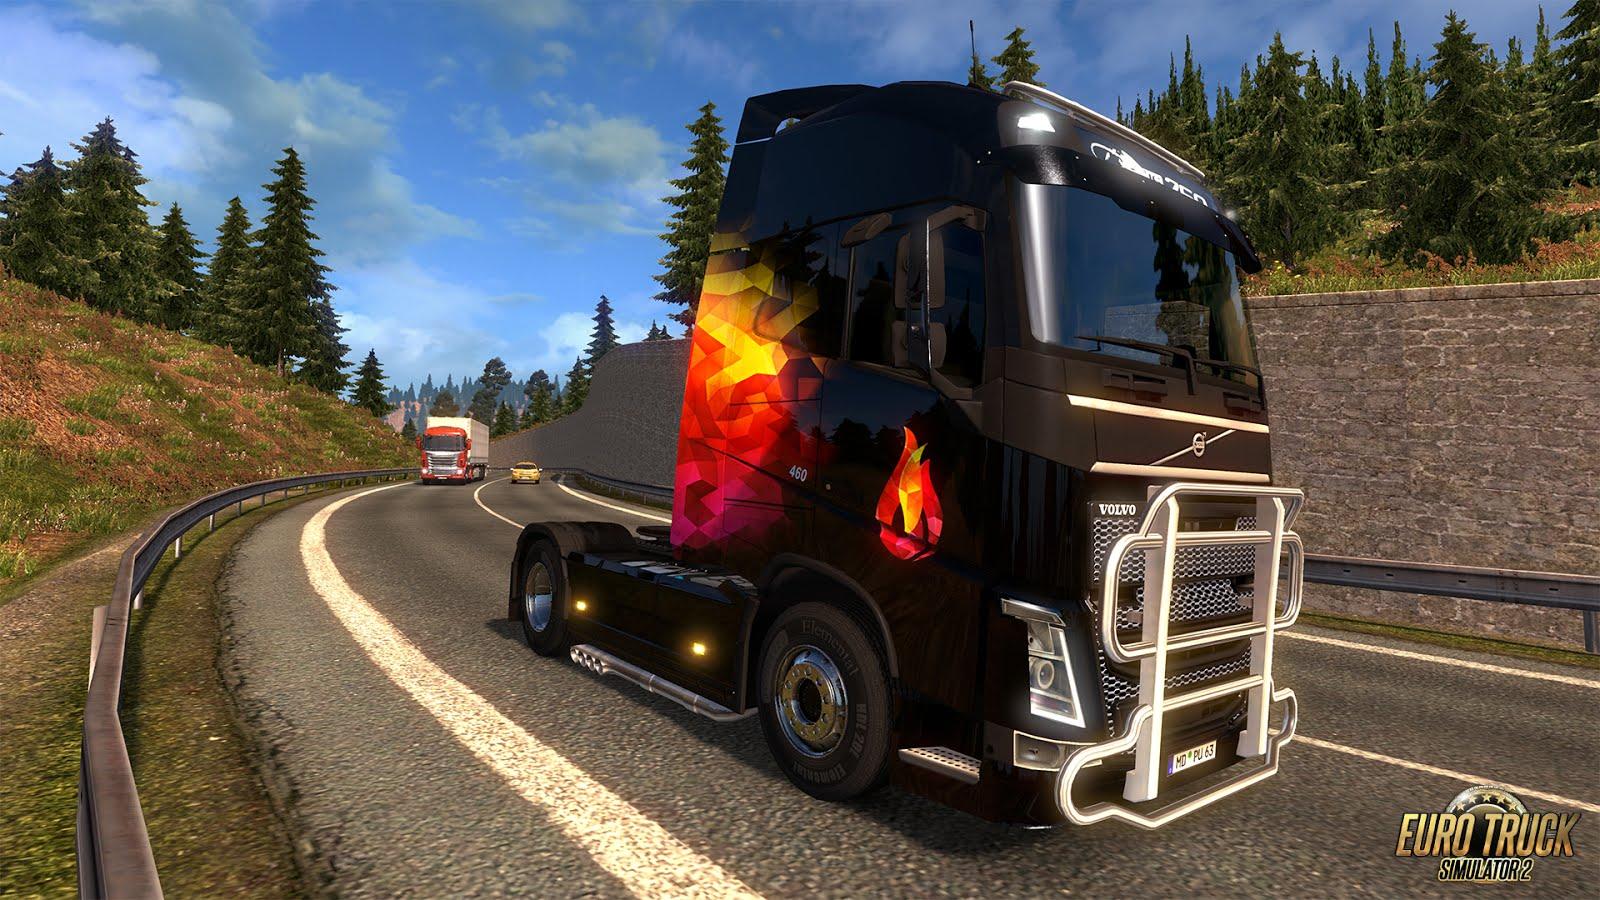 neues aus dem scs blog euro truck simulator. Black Bedroom Furniture Sets. Home Design Ideas